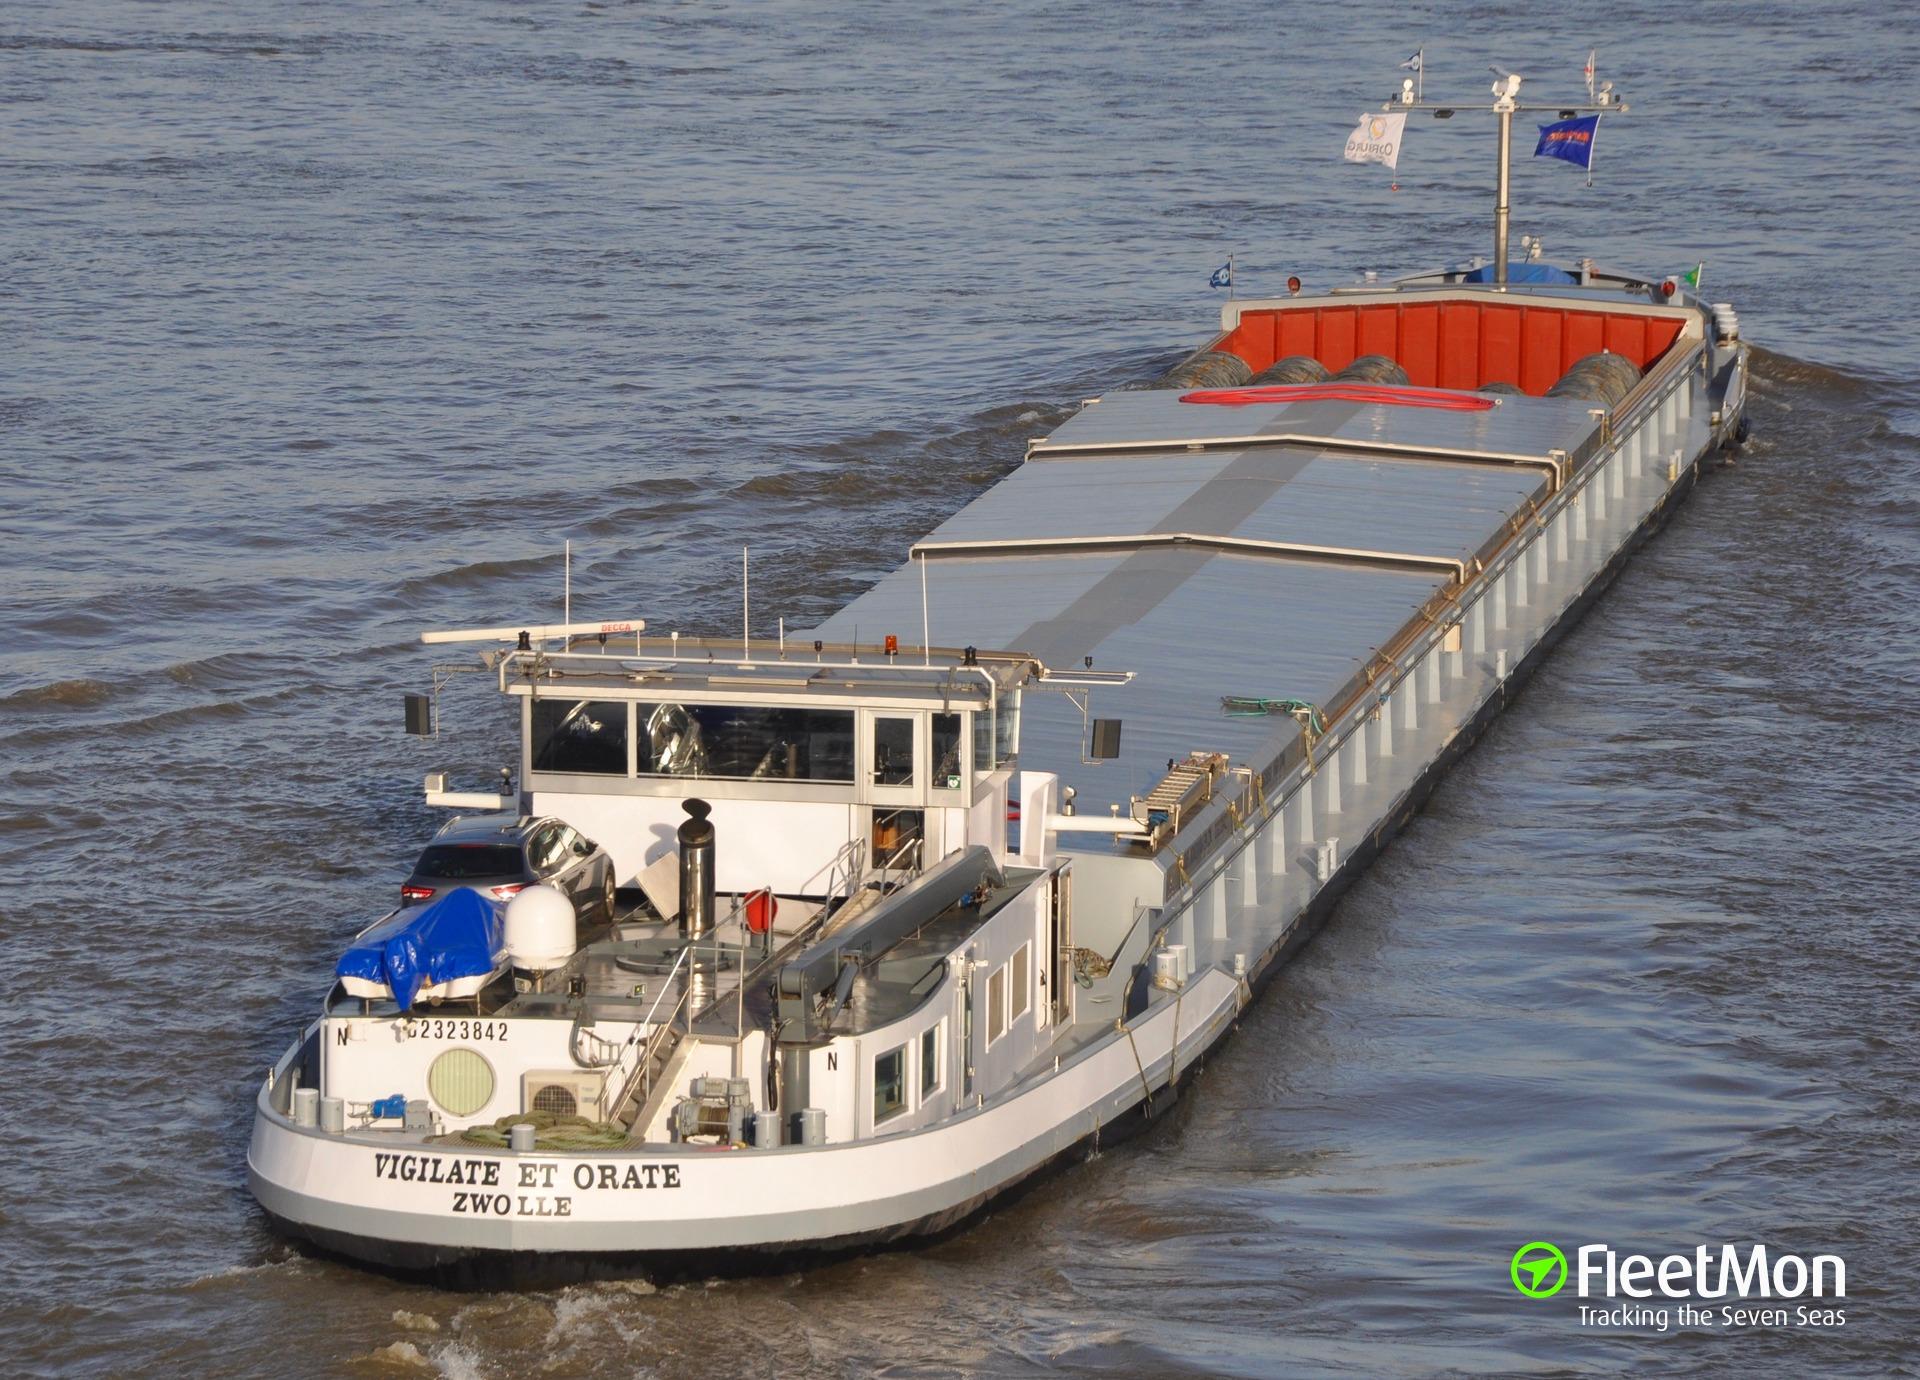 VIGILATE ET ORATE (Cargo Ship) IMO